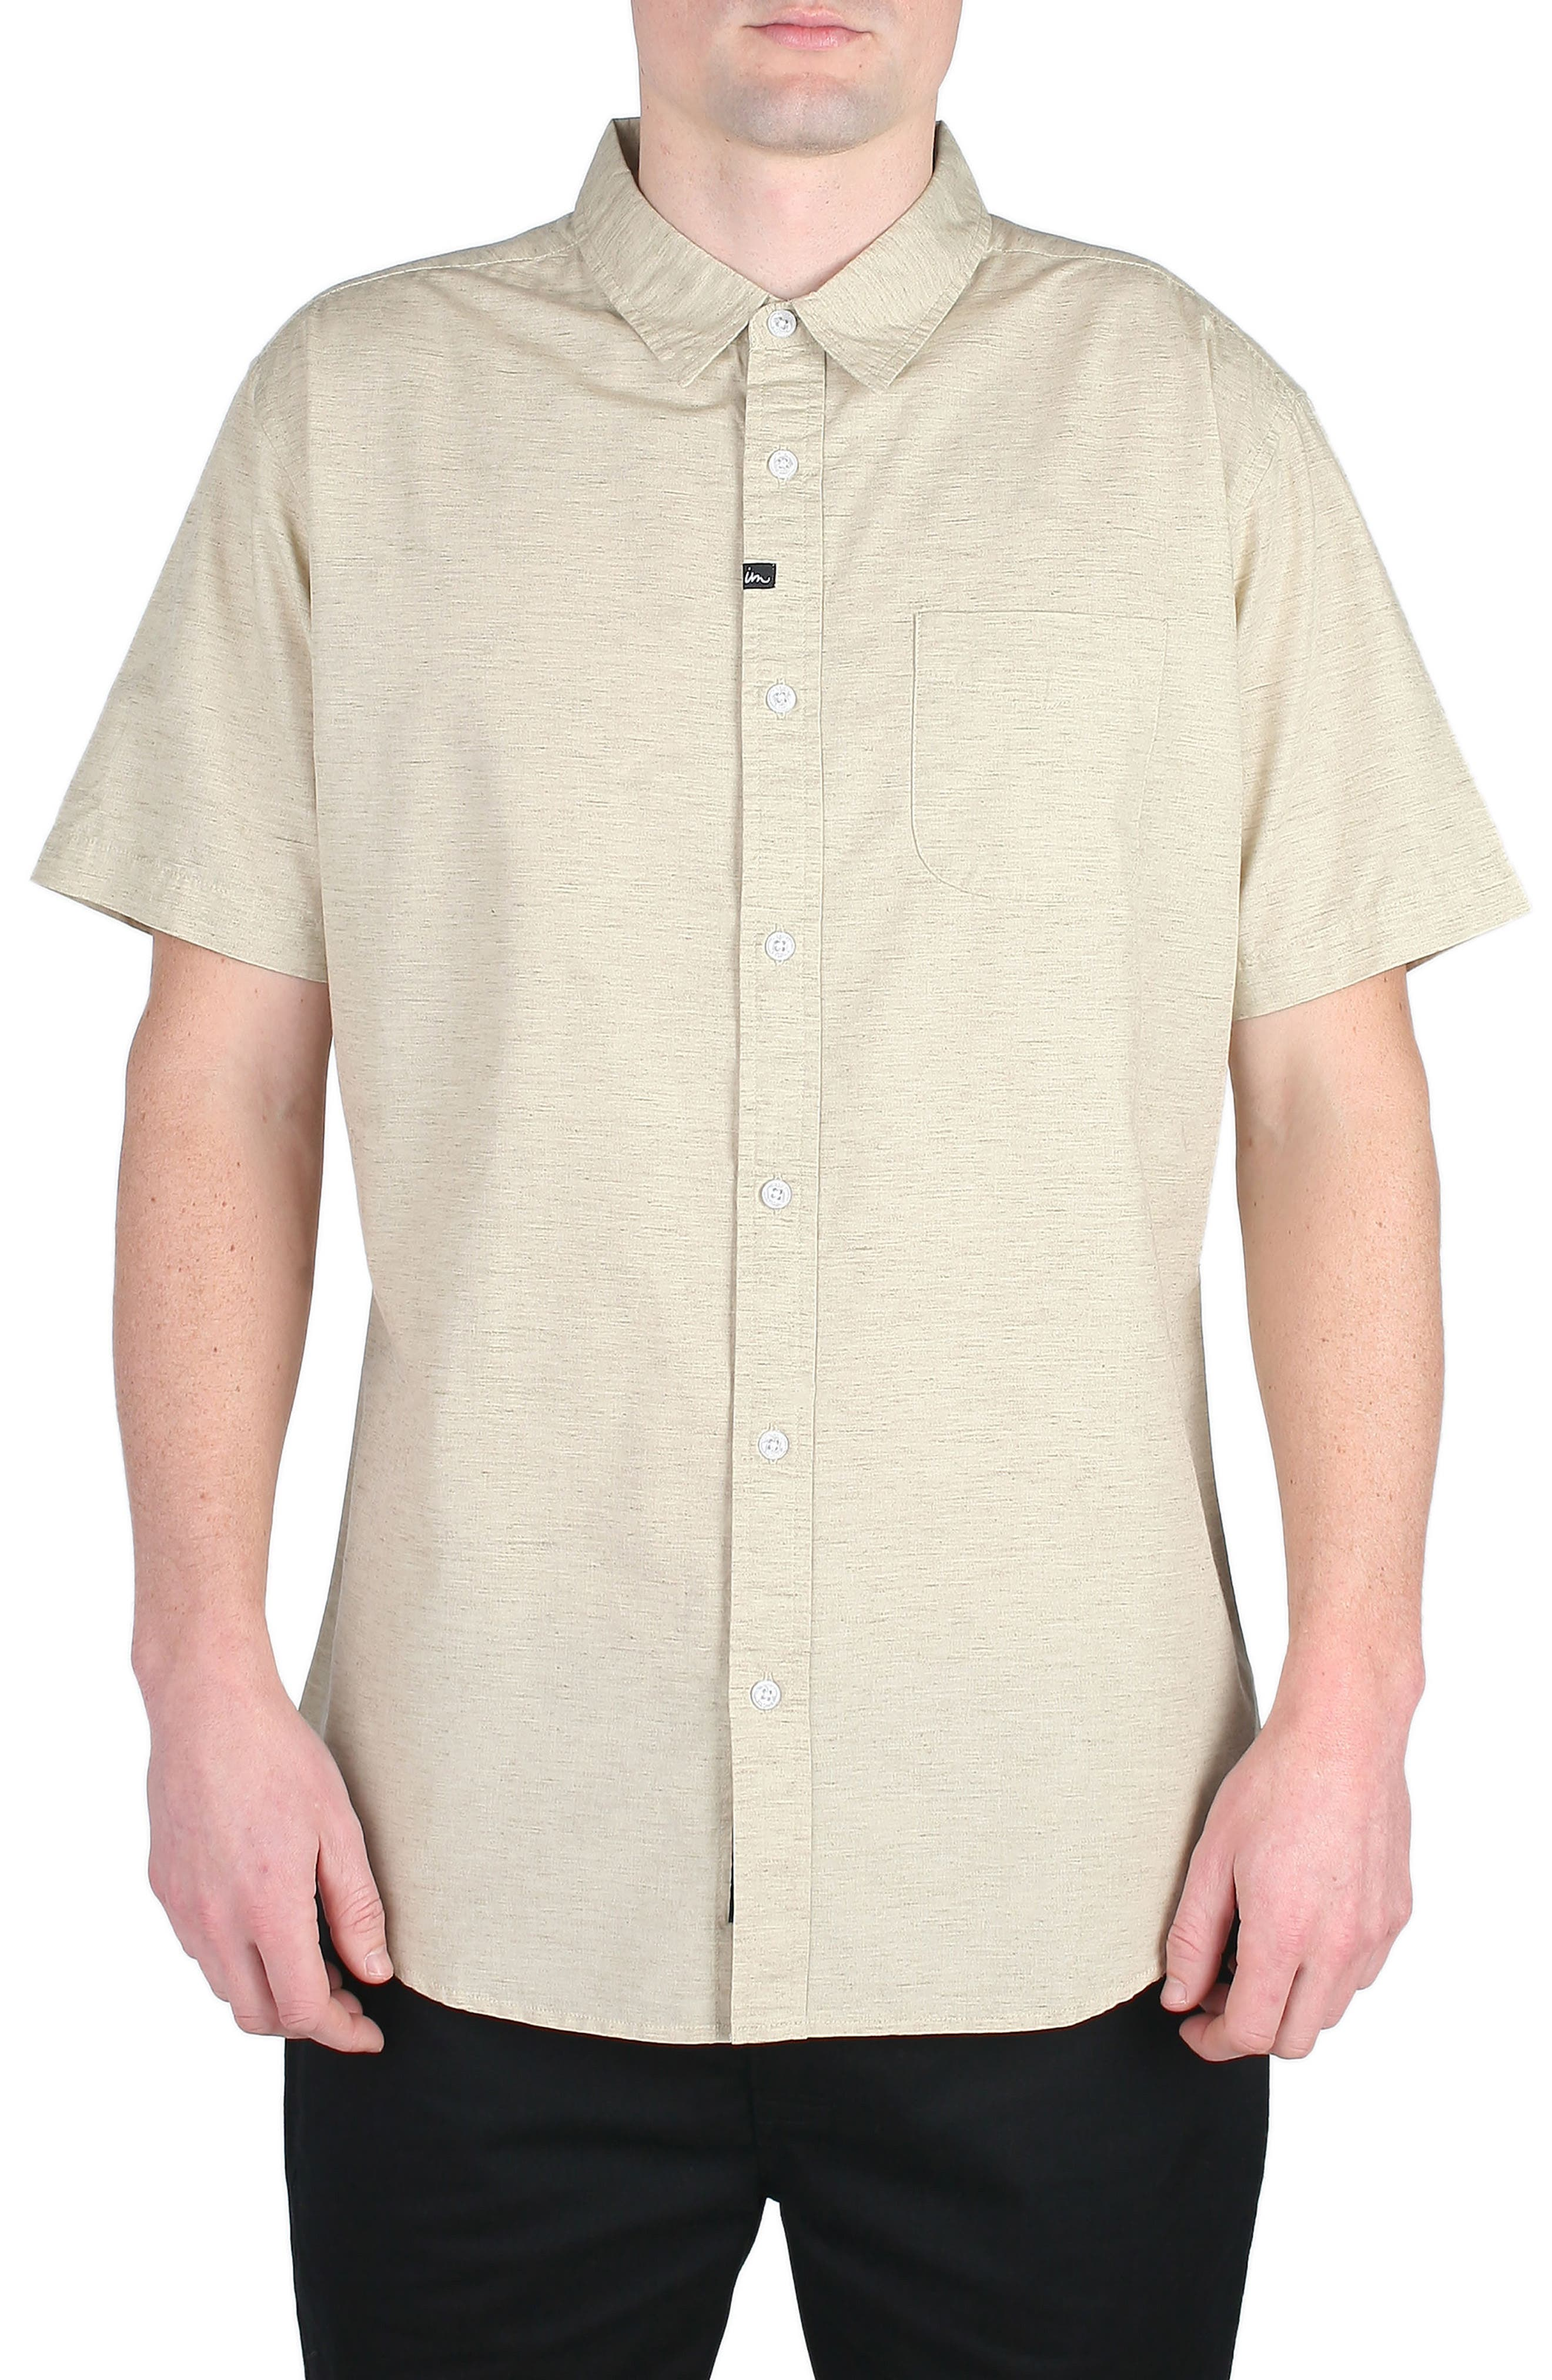 Imperial Motion Triumph Woven Shirt